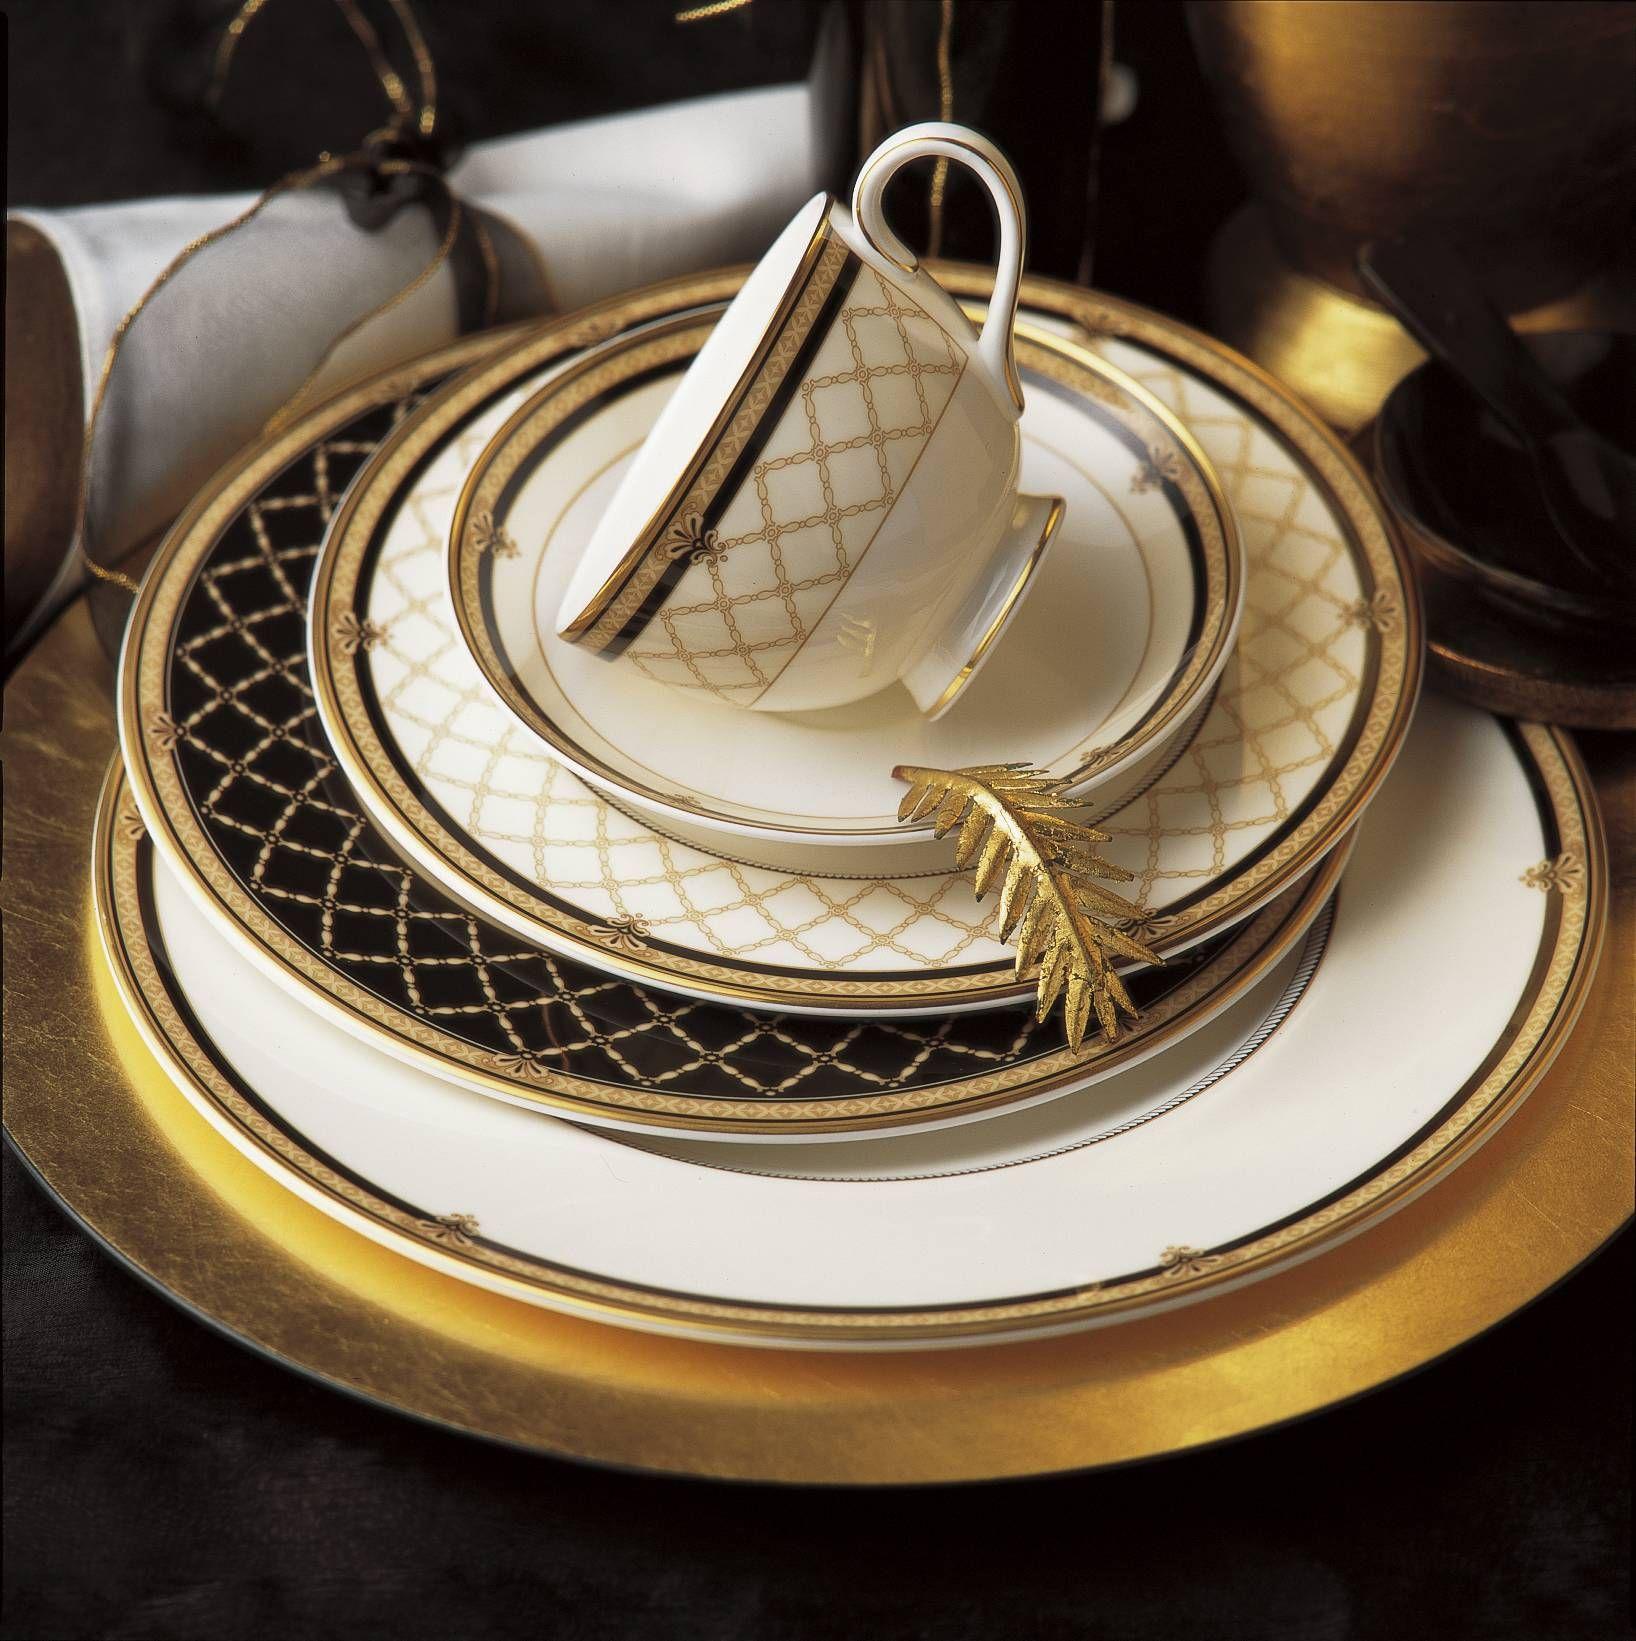 Royal Doulton - Baroness | Fine china | Pinterest | Royal ...